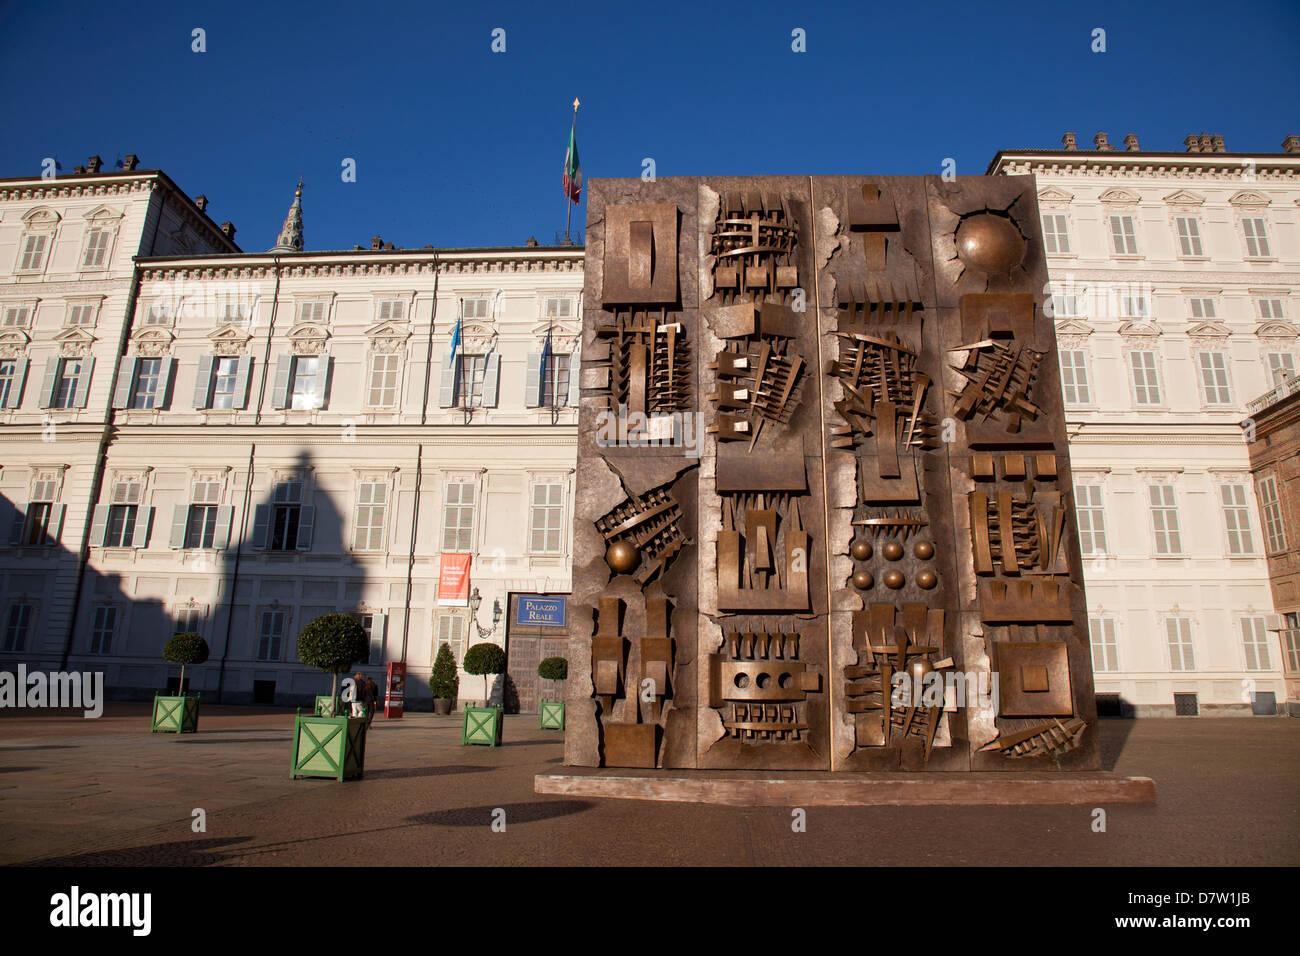 Arnaldo Pomodoro sculptures at The Royal Palace (Palazzo Reale), Turin, Piedmont, Italy - Stock Image